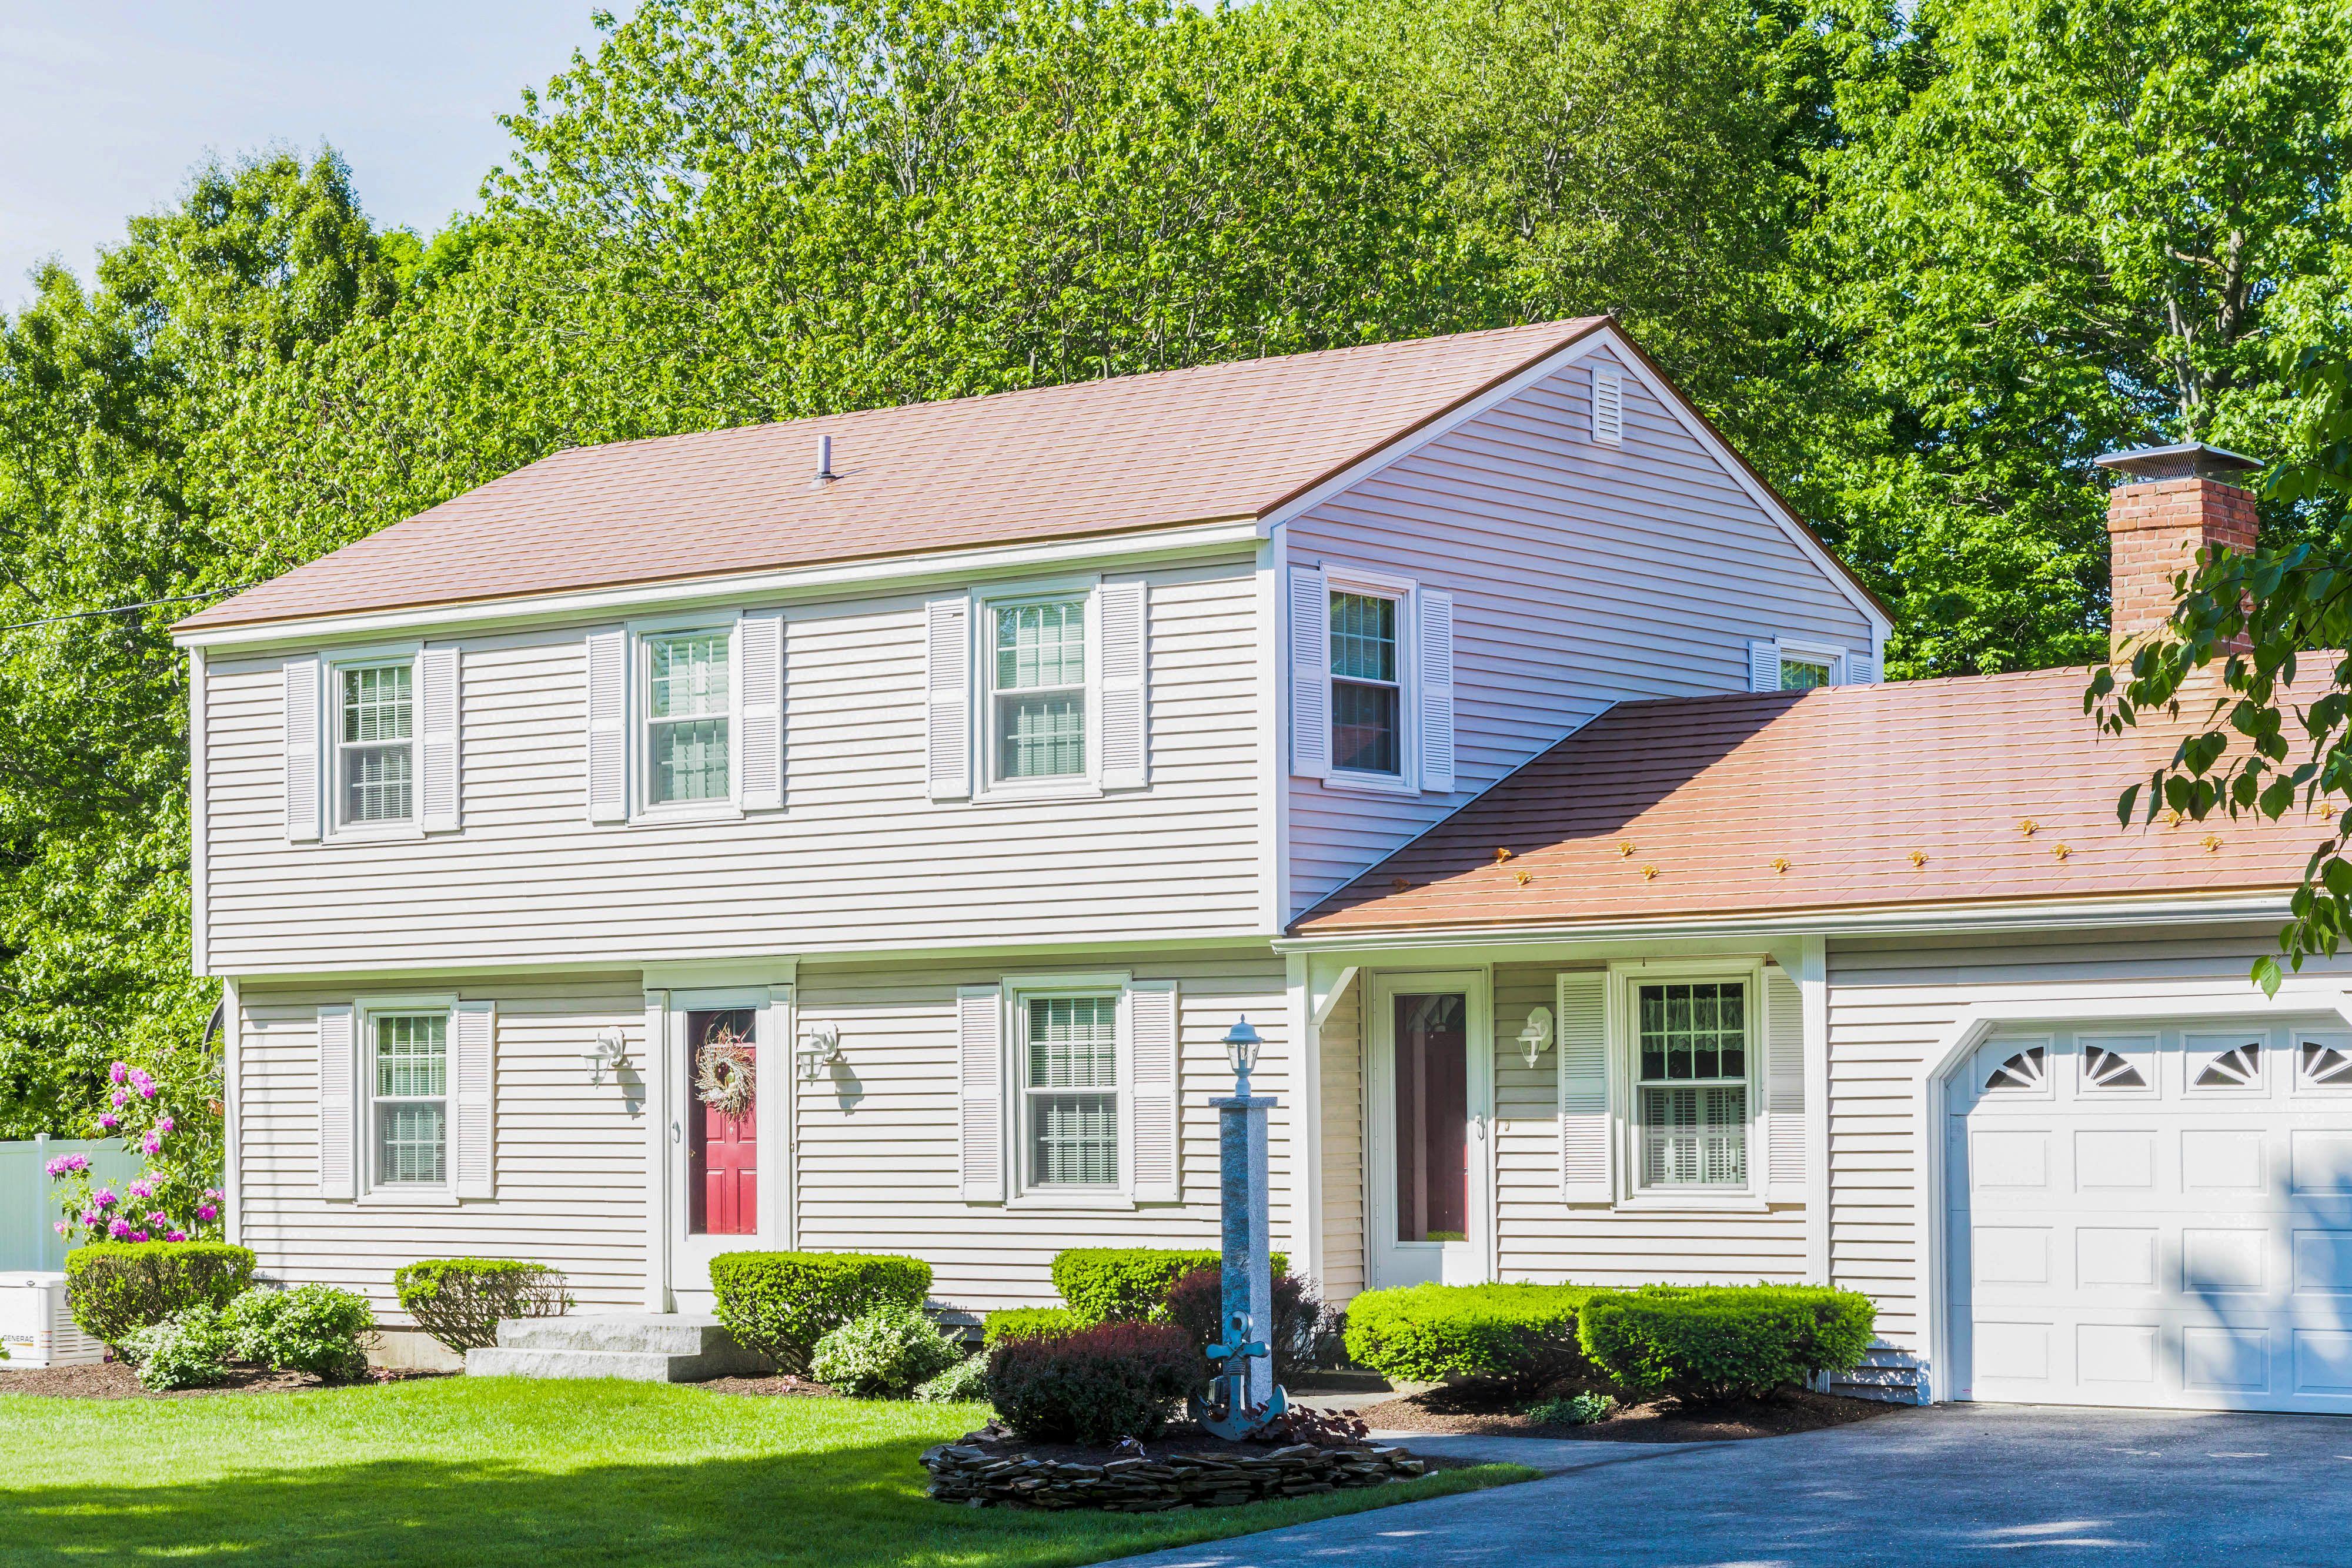 Best Slate Roofing Metal Roof Slate Roof Roof Colors 400 x 300